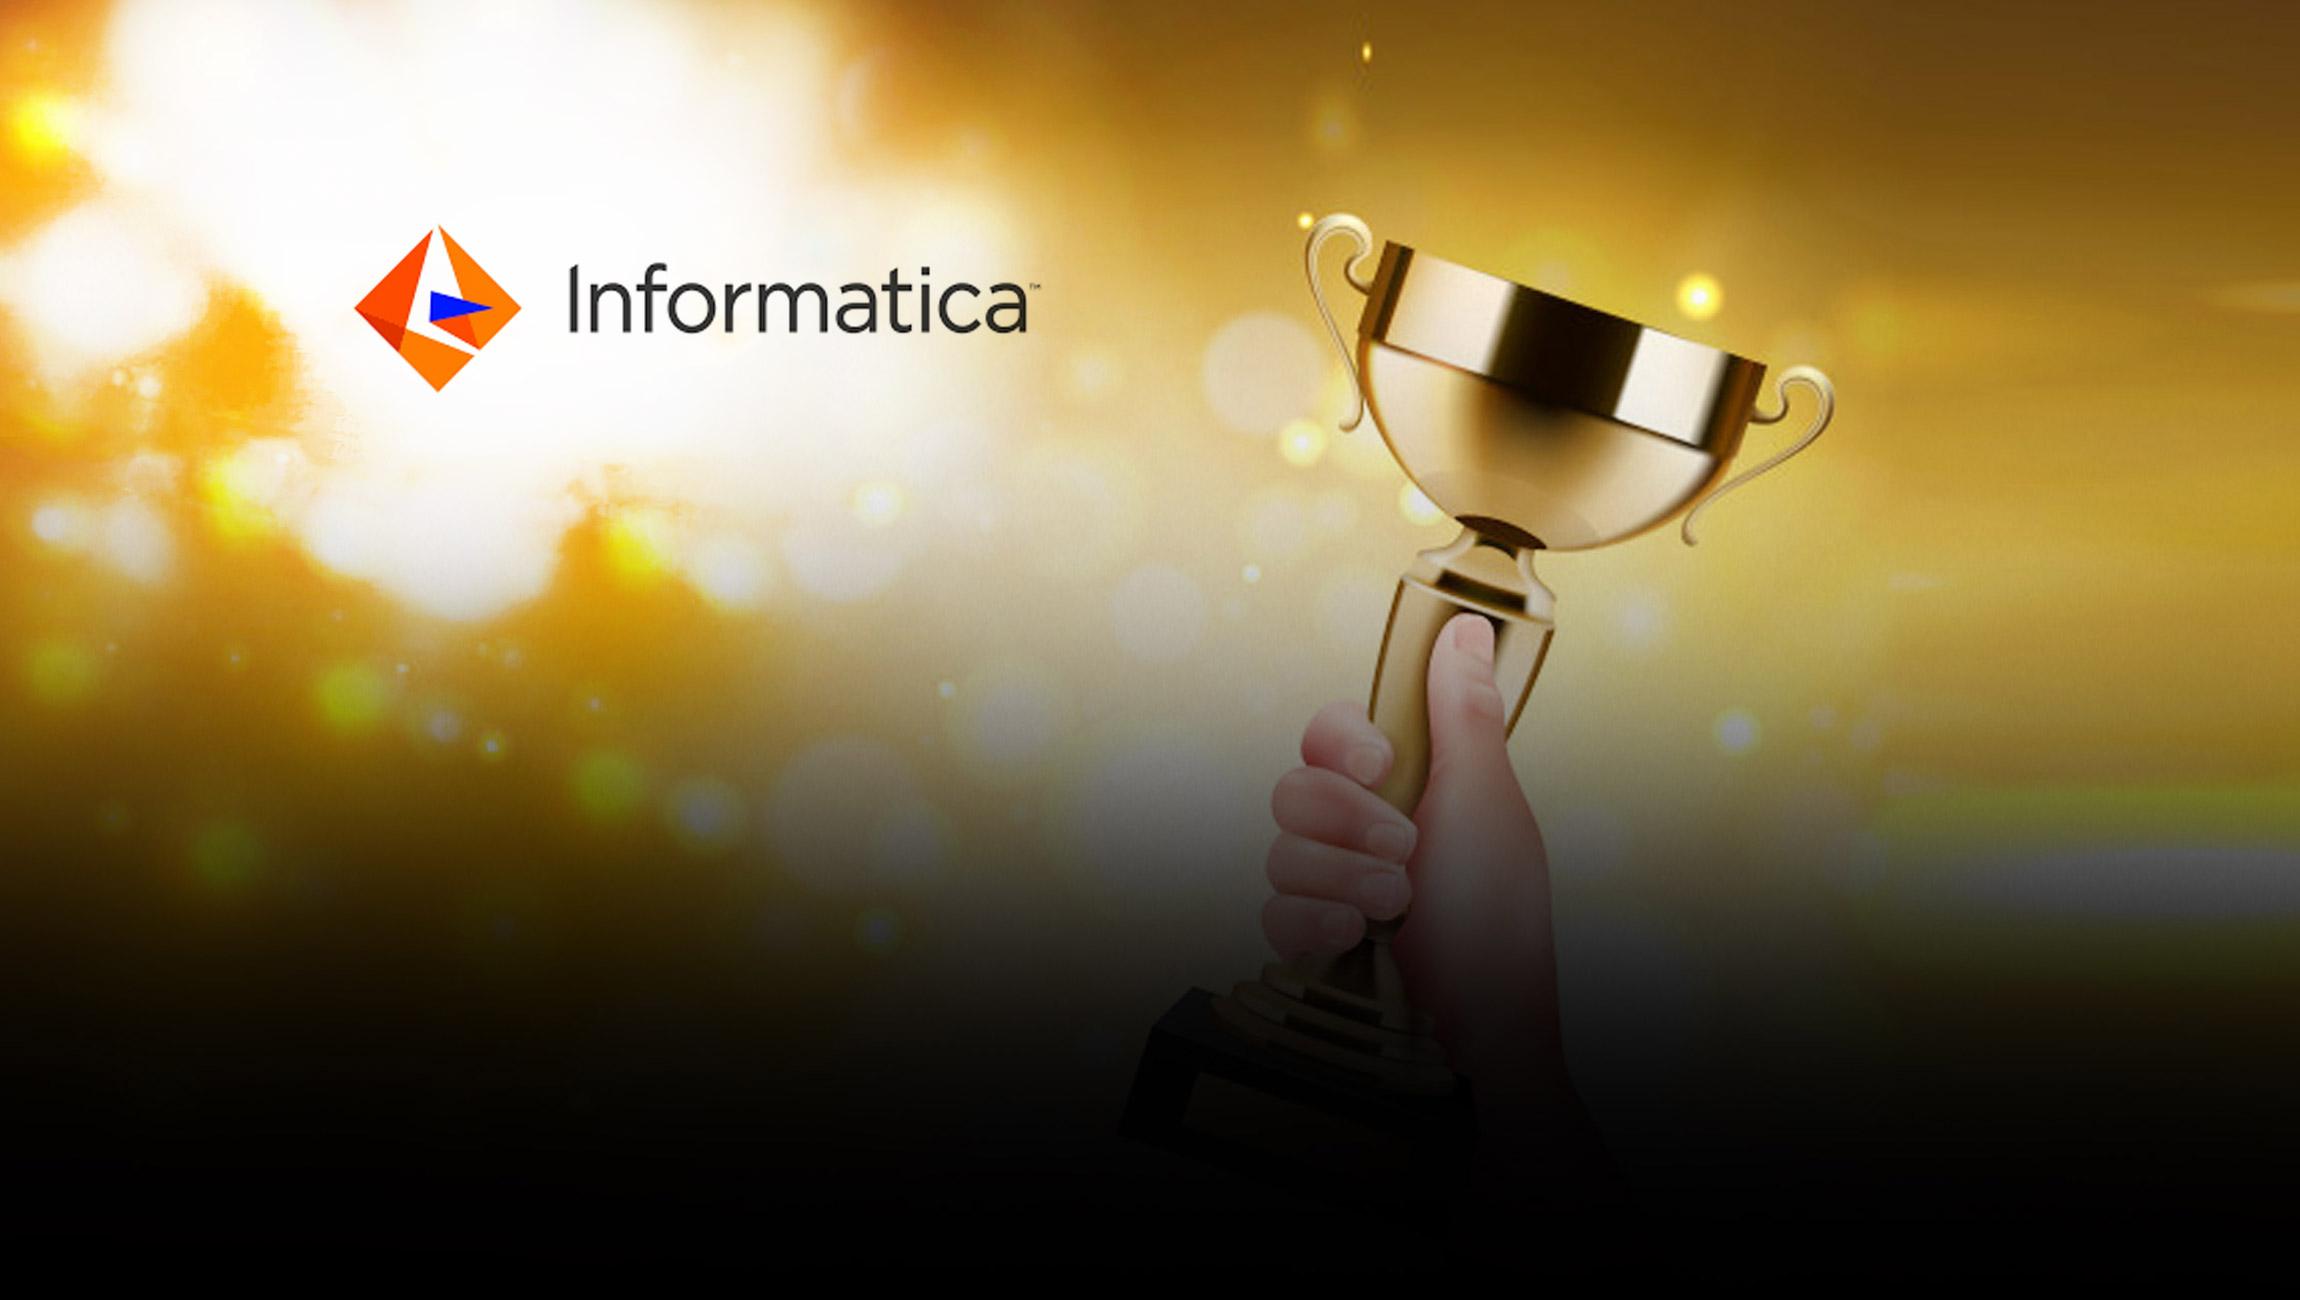 Informatica Honors Intelligent Disruptors in 2021 Innovation Awards